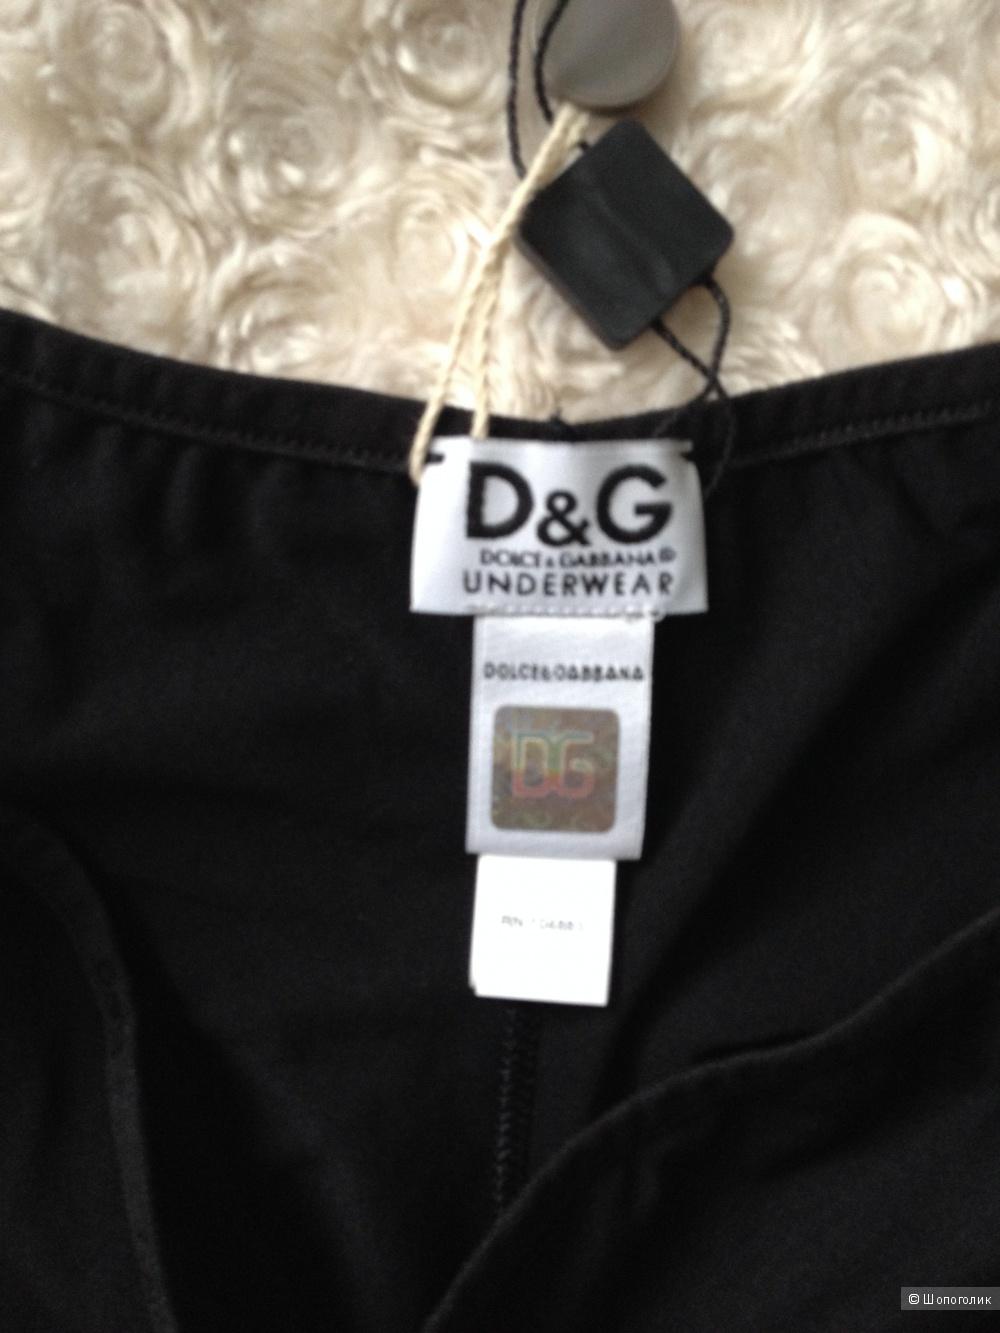 Трусы D&G underwear размер I IT / S